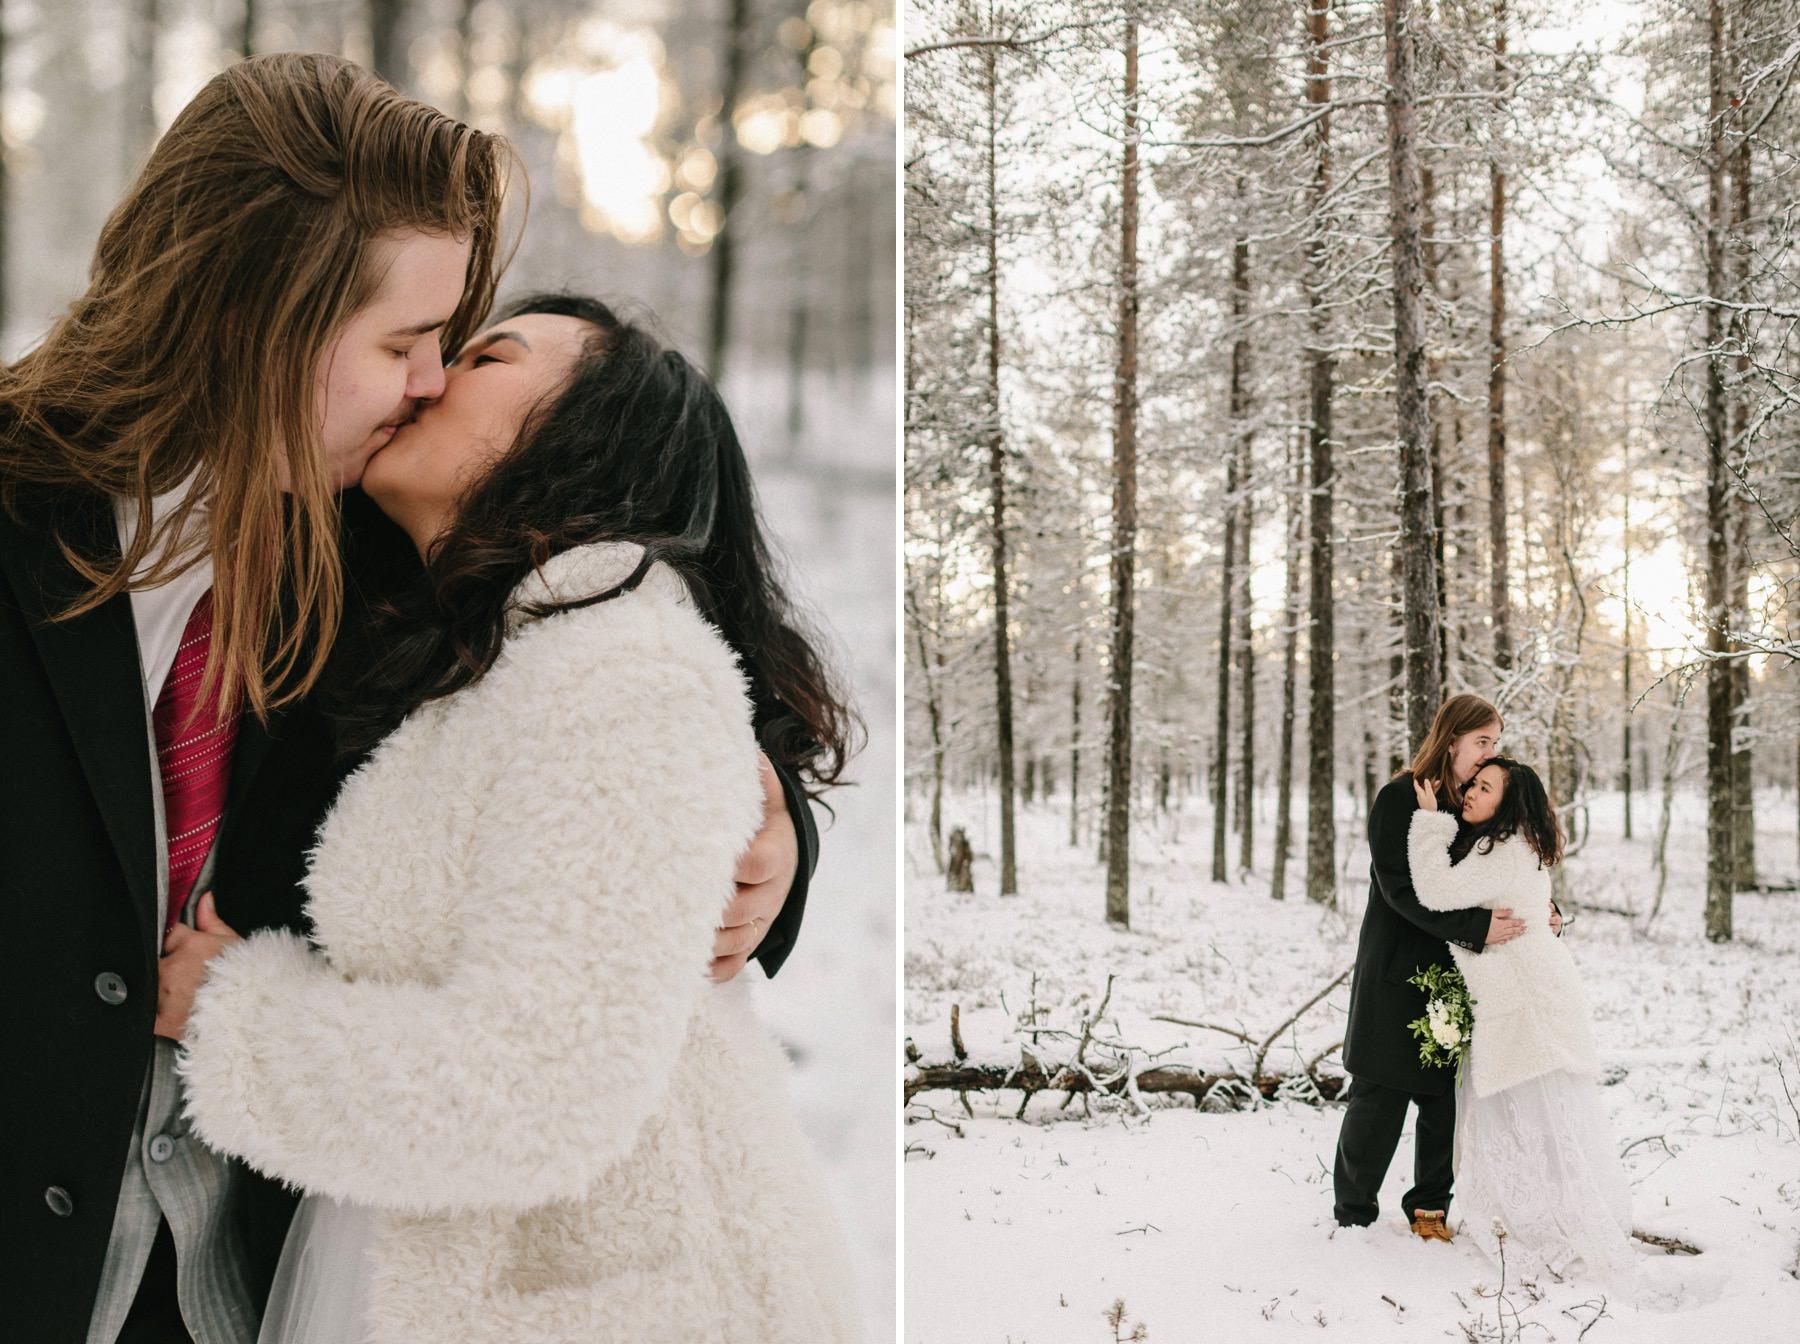 Lapland photo session